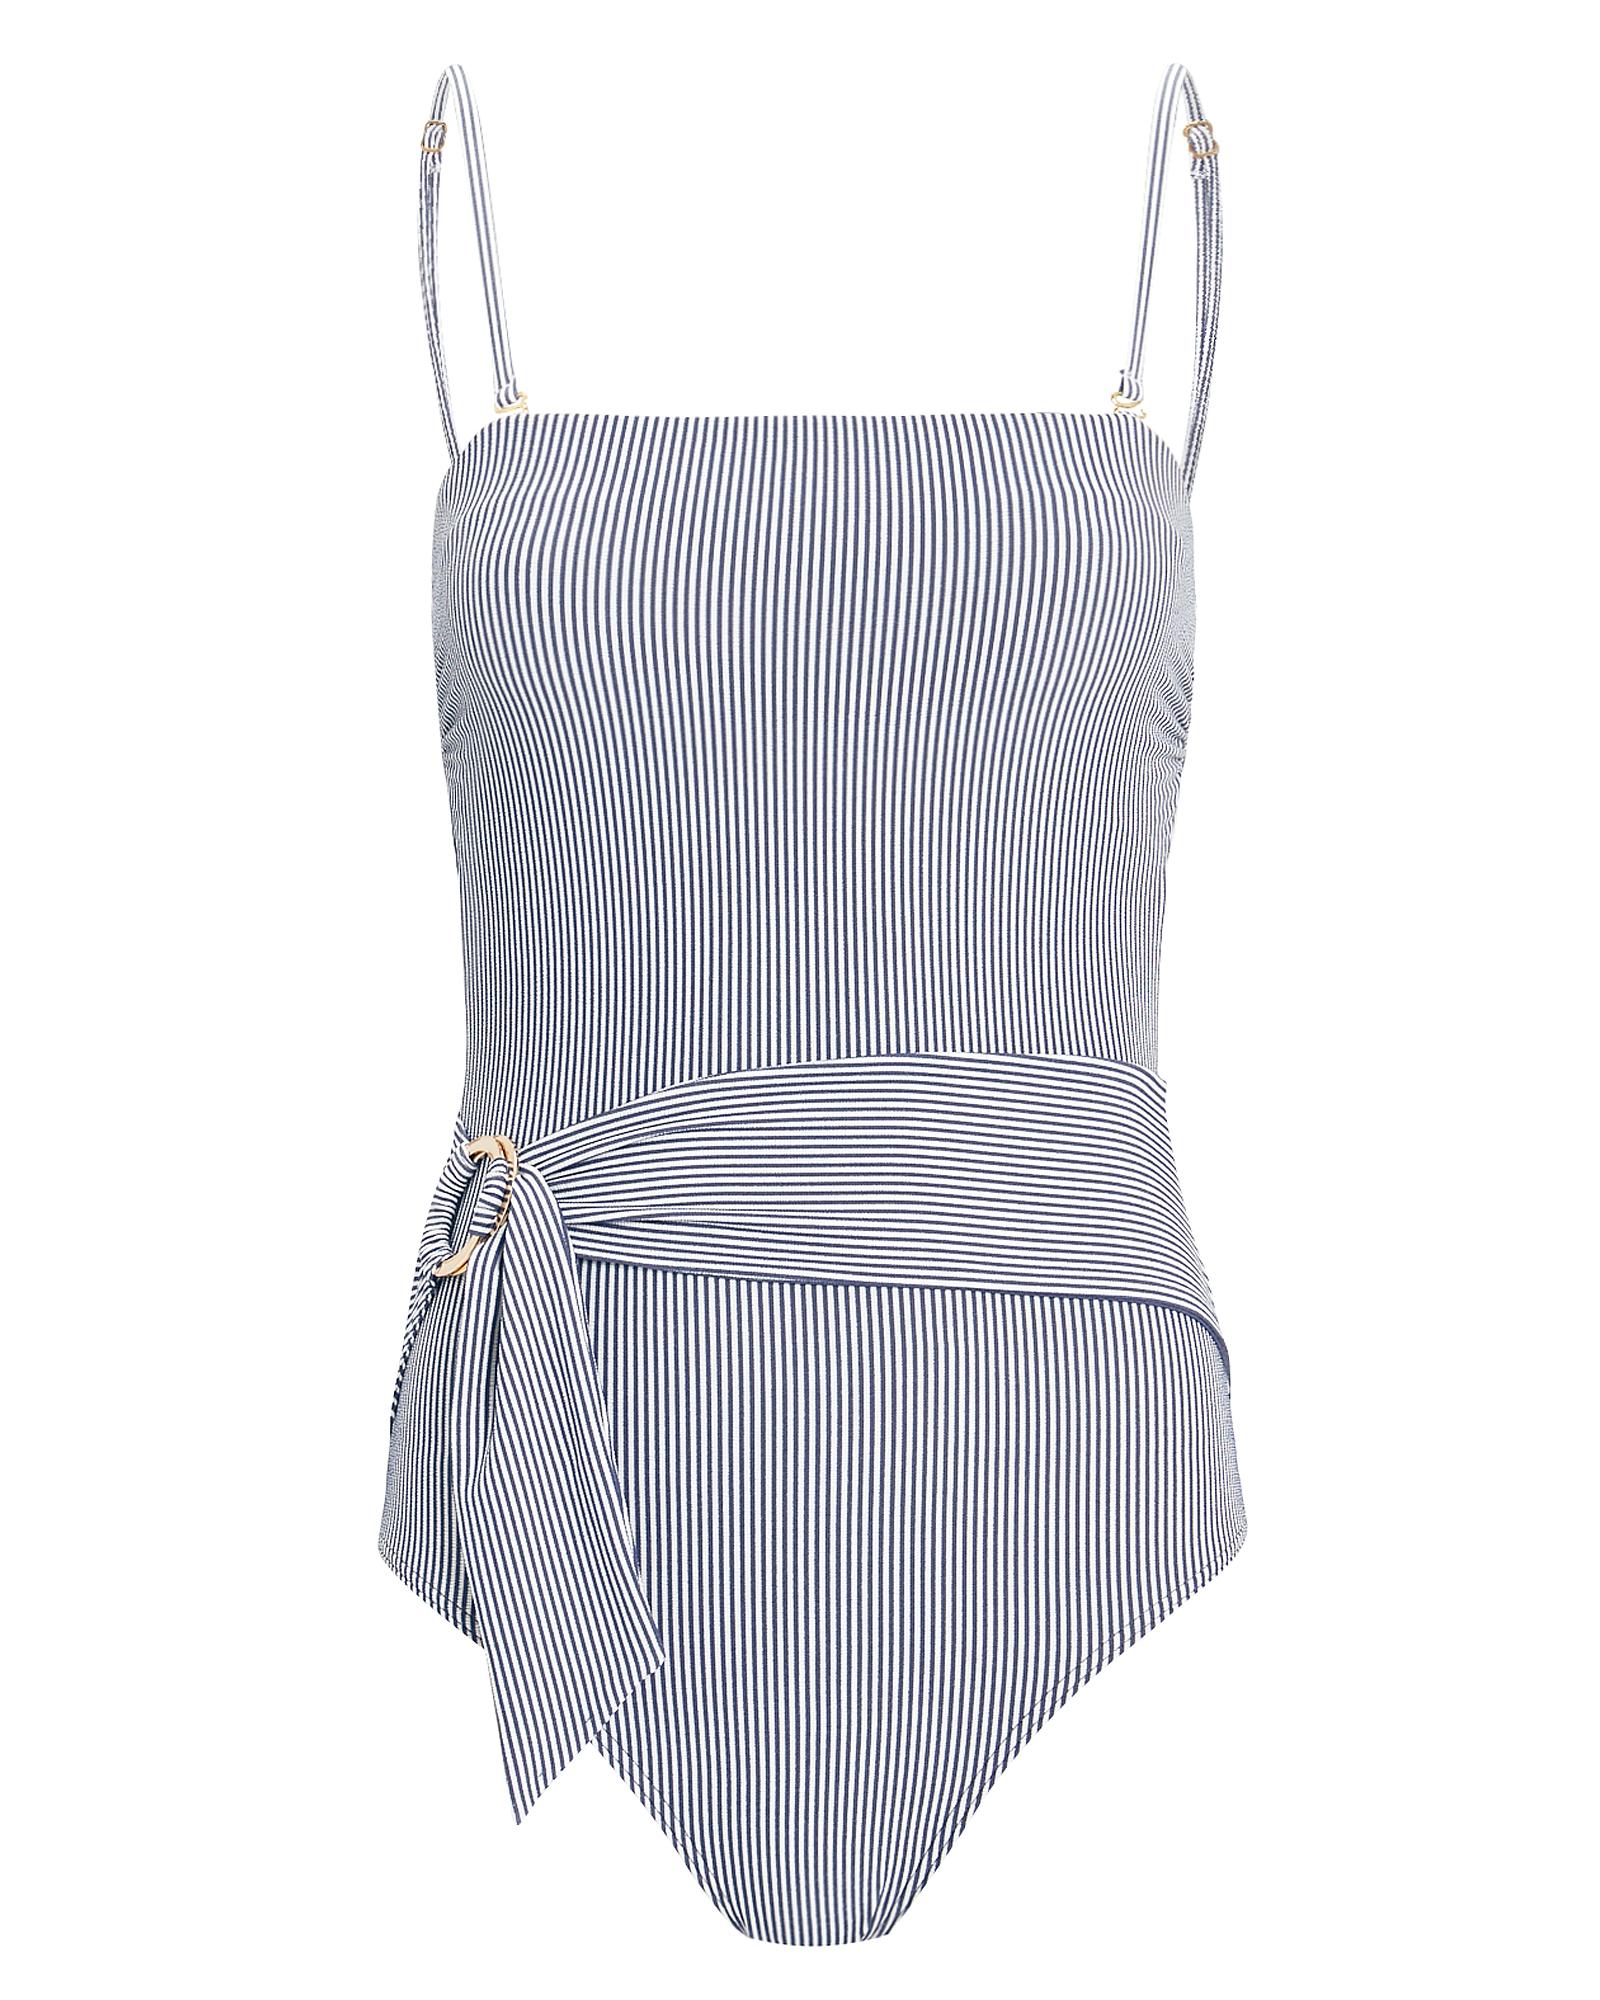 Suboo Suits Shoreline One Piece Swimsuit